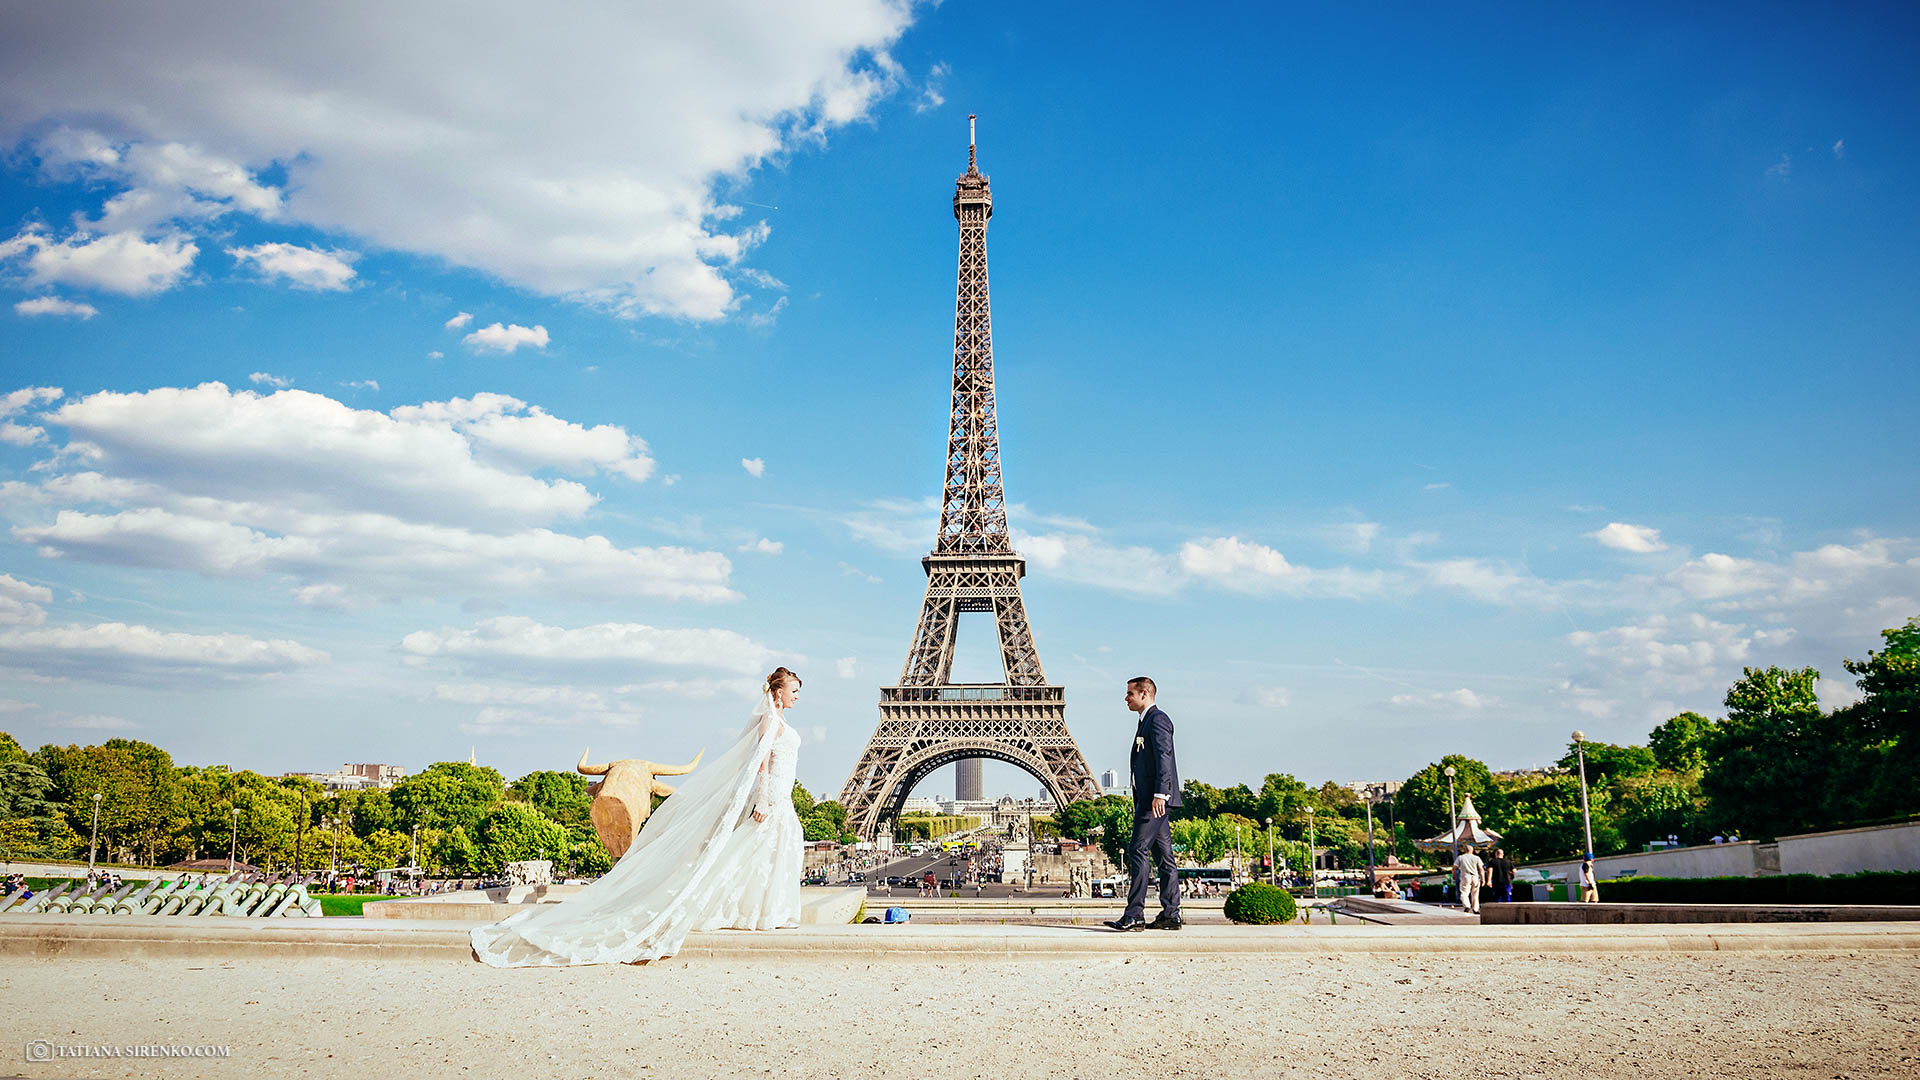 A wedding photo Paris